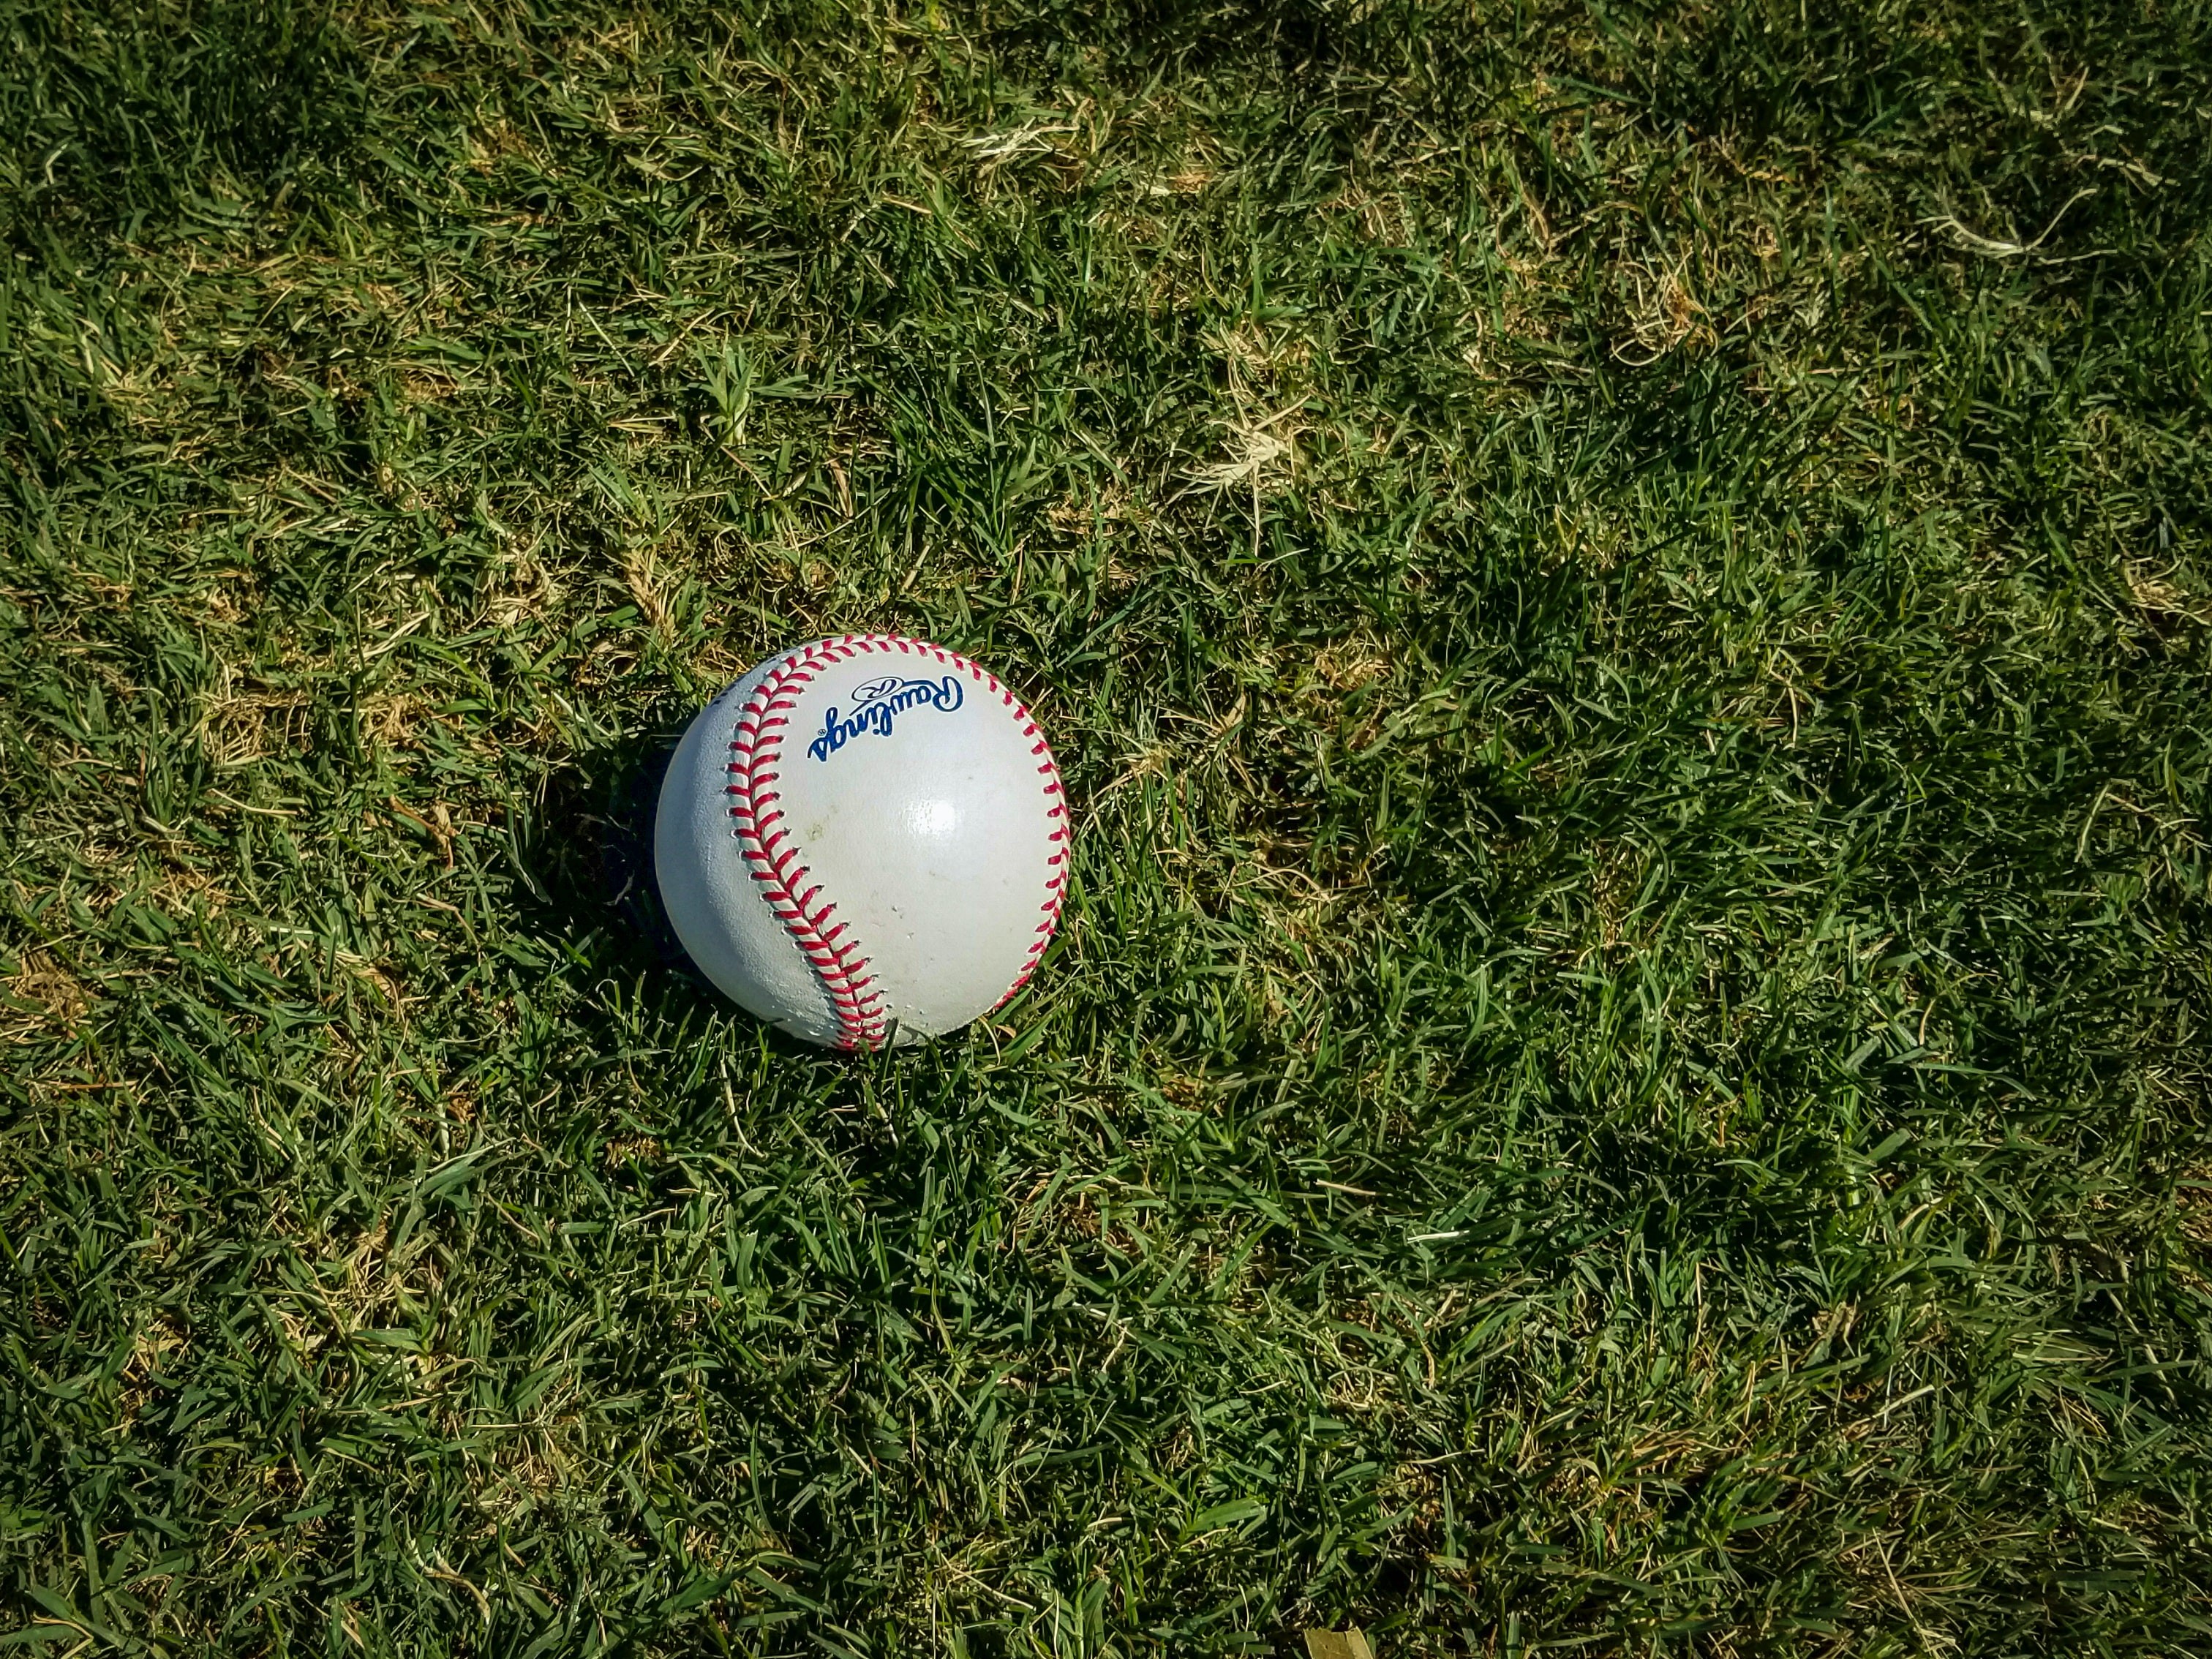 Baseball in Jackson, TN